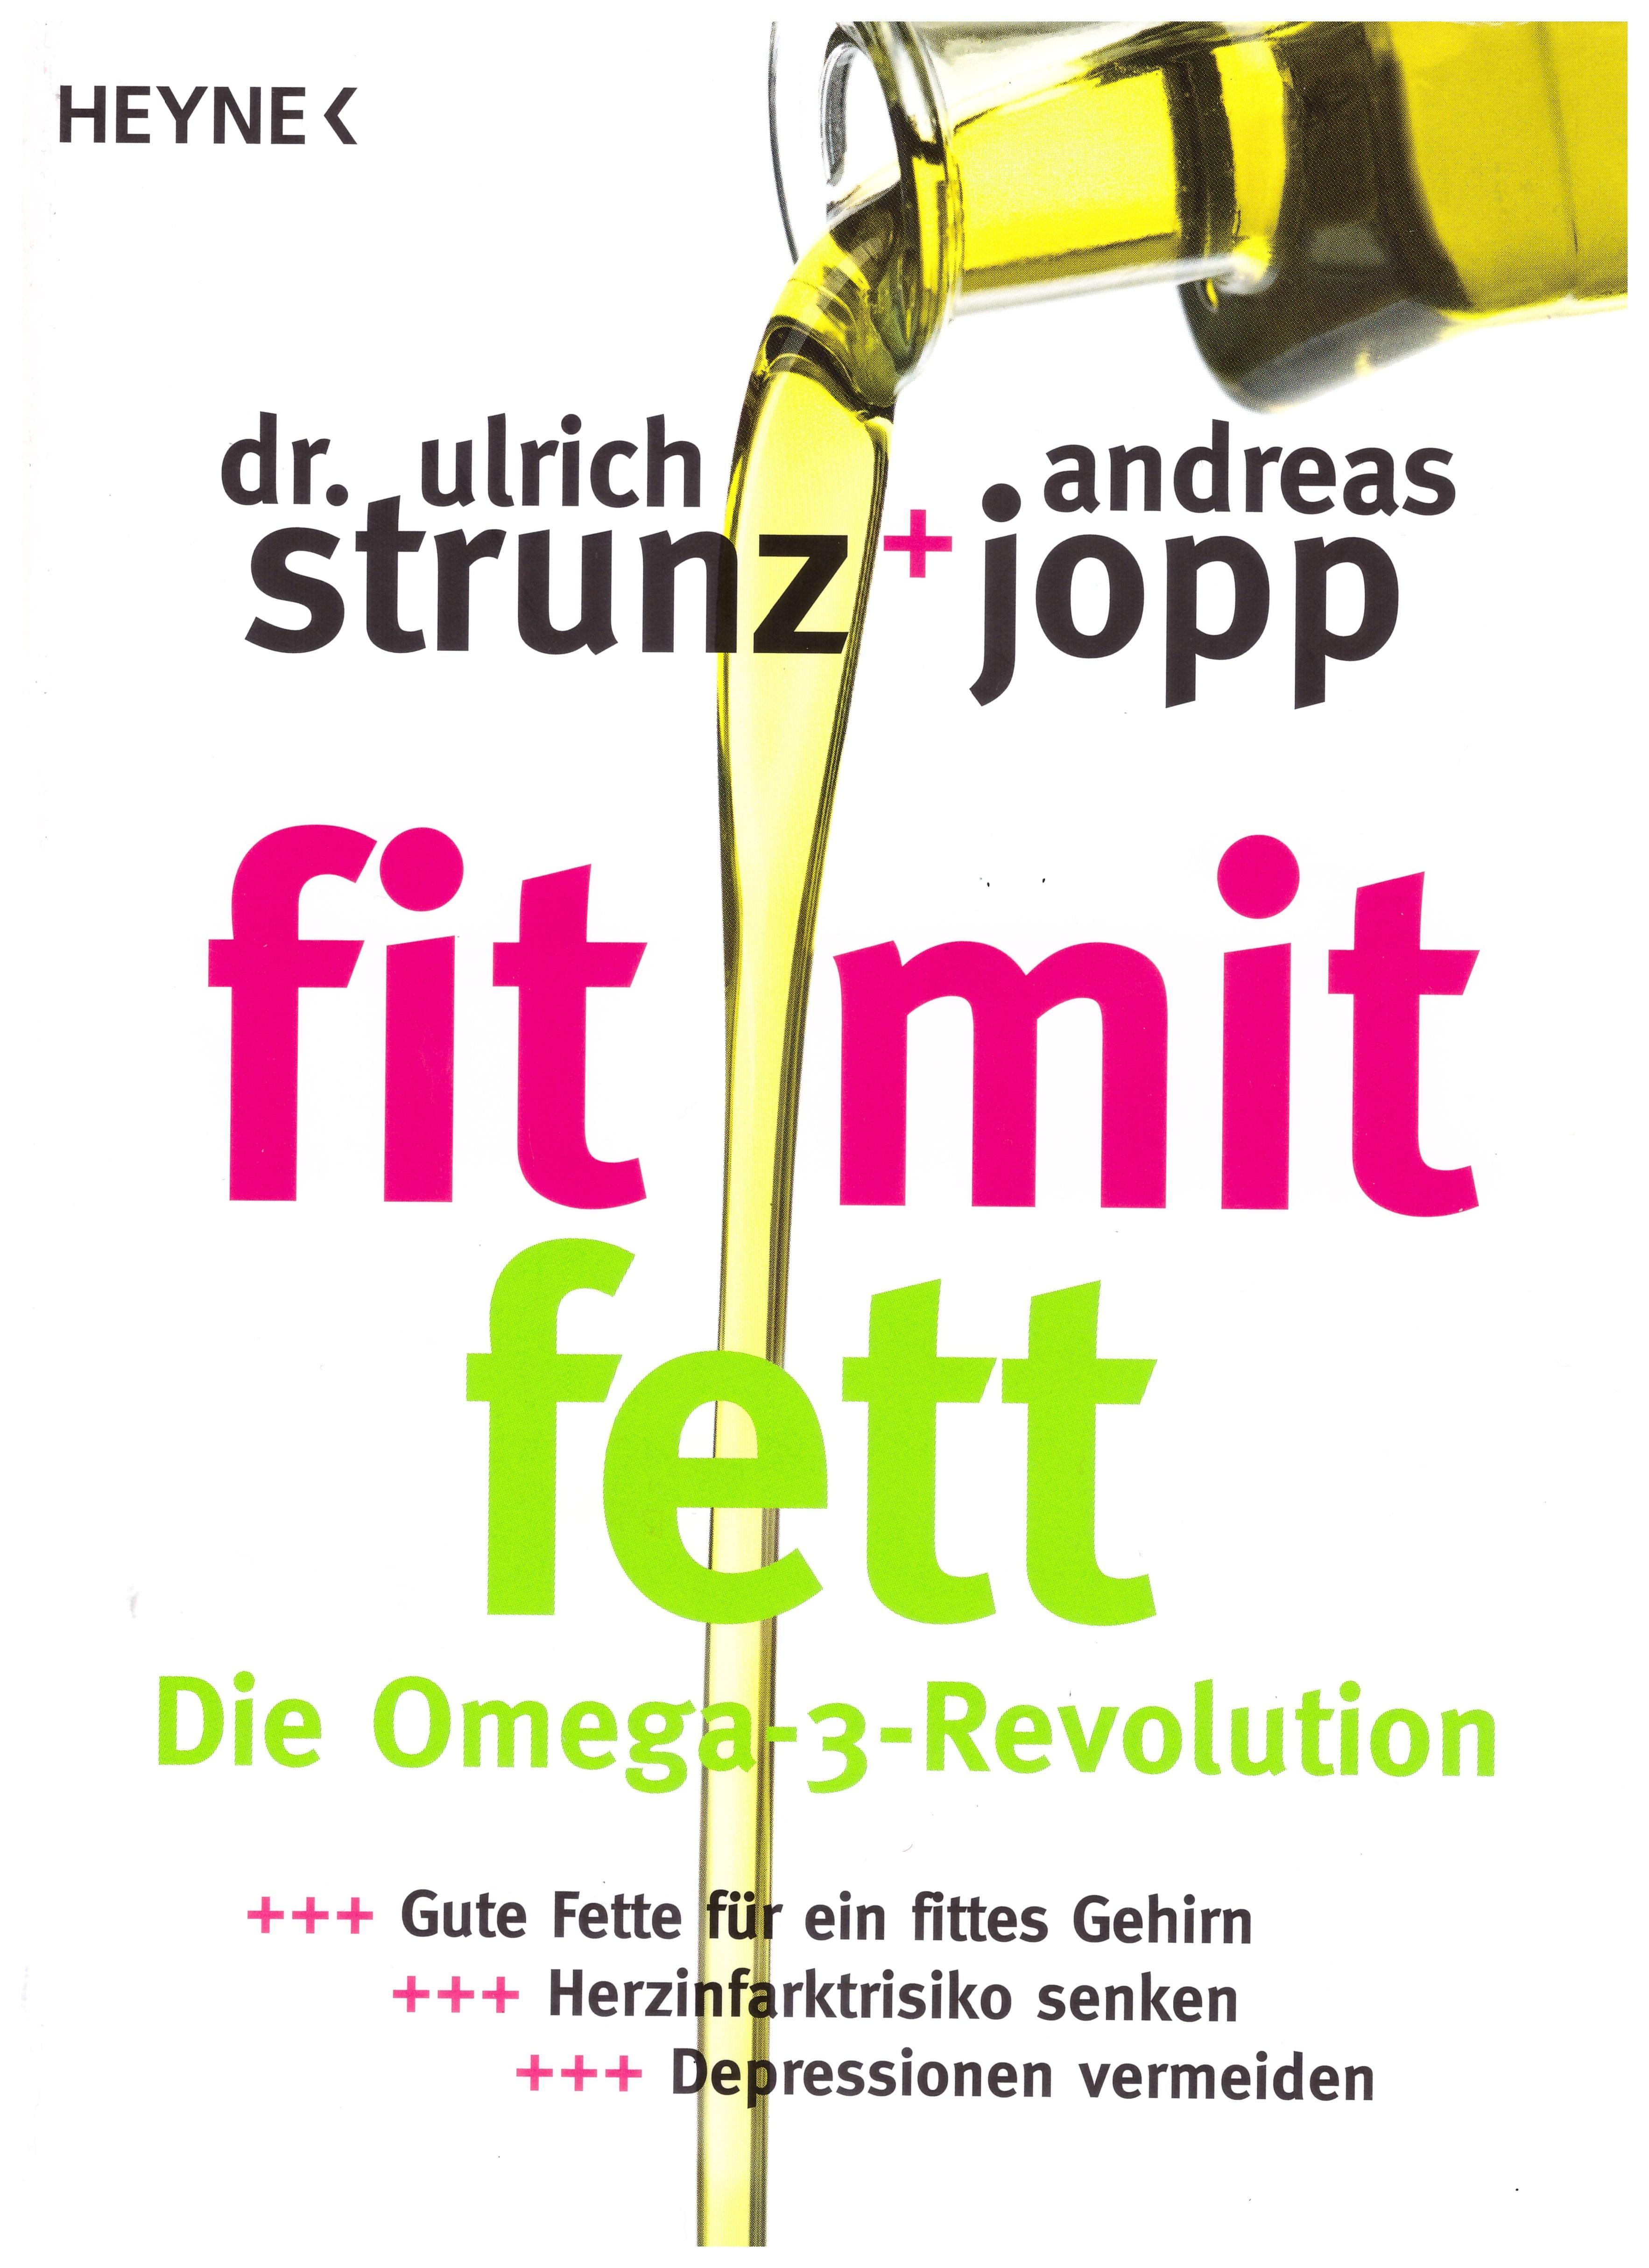 Strunz + Jopp -fit mit fett